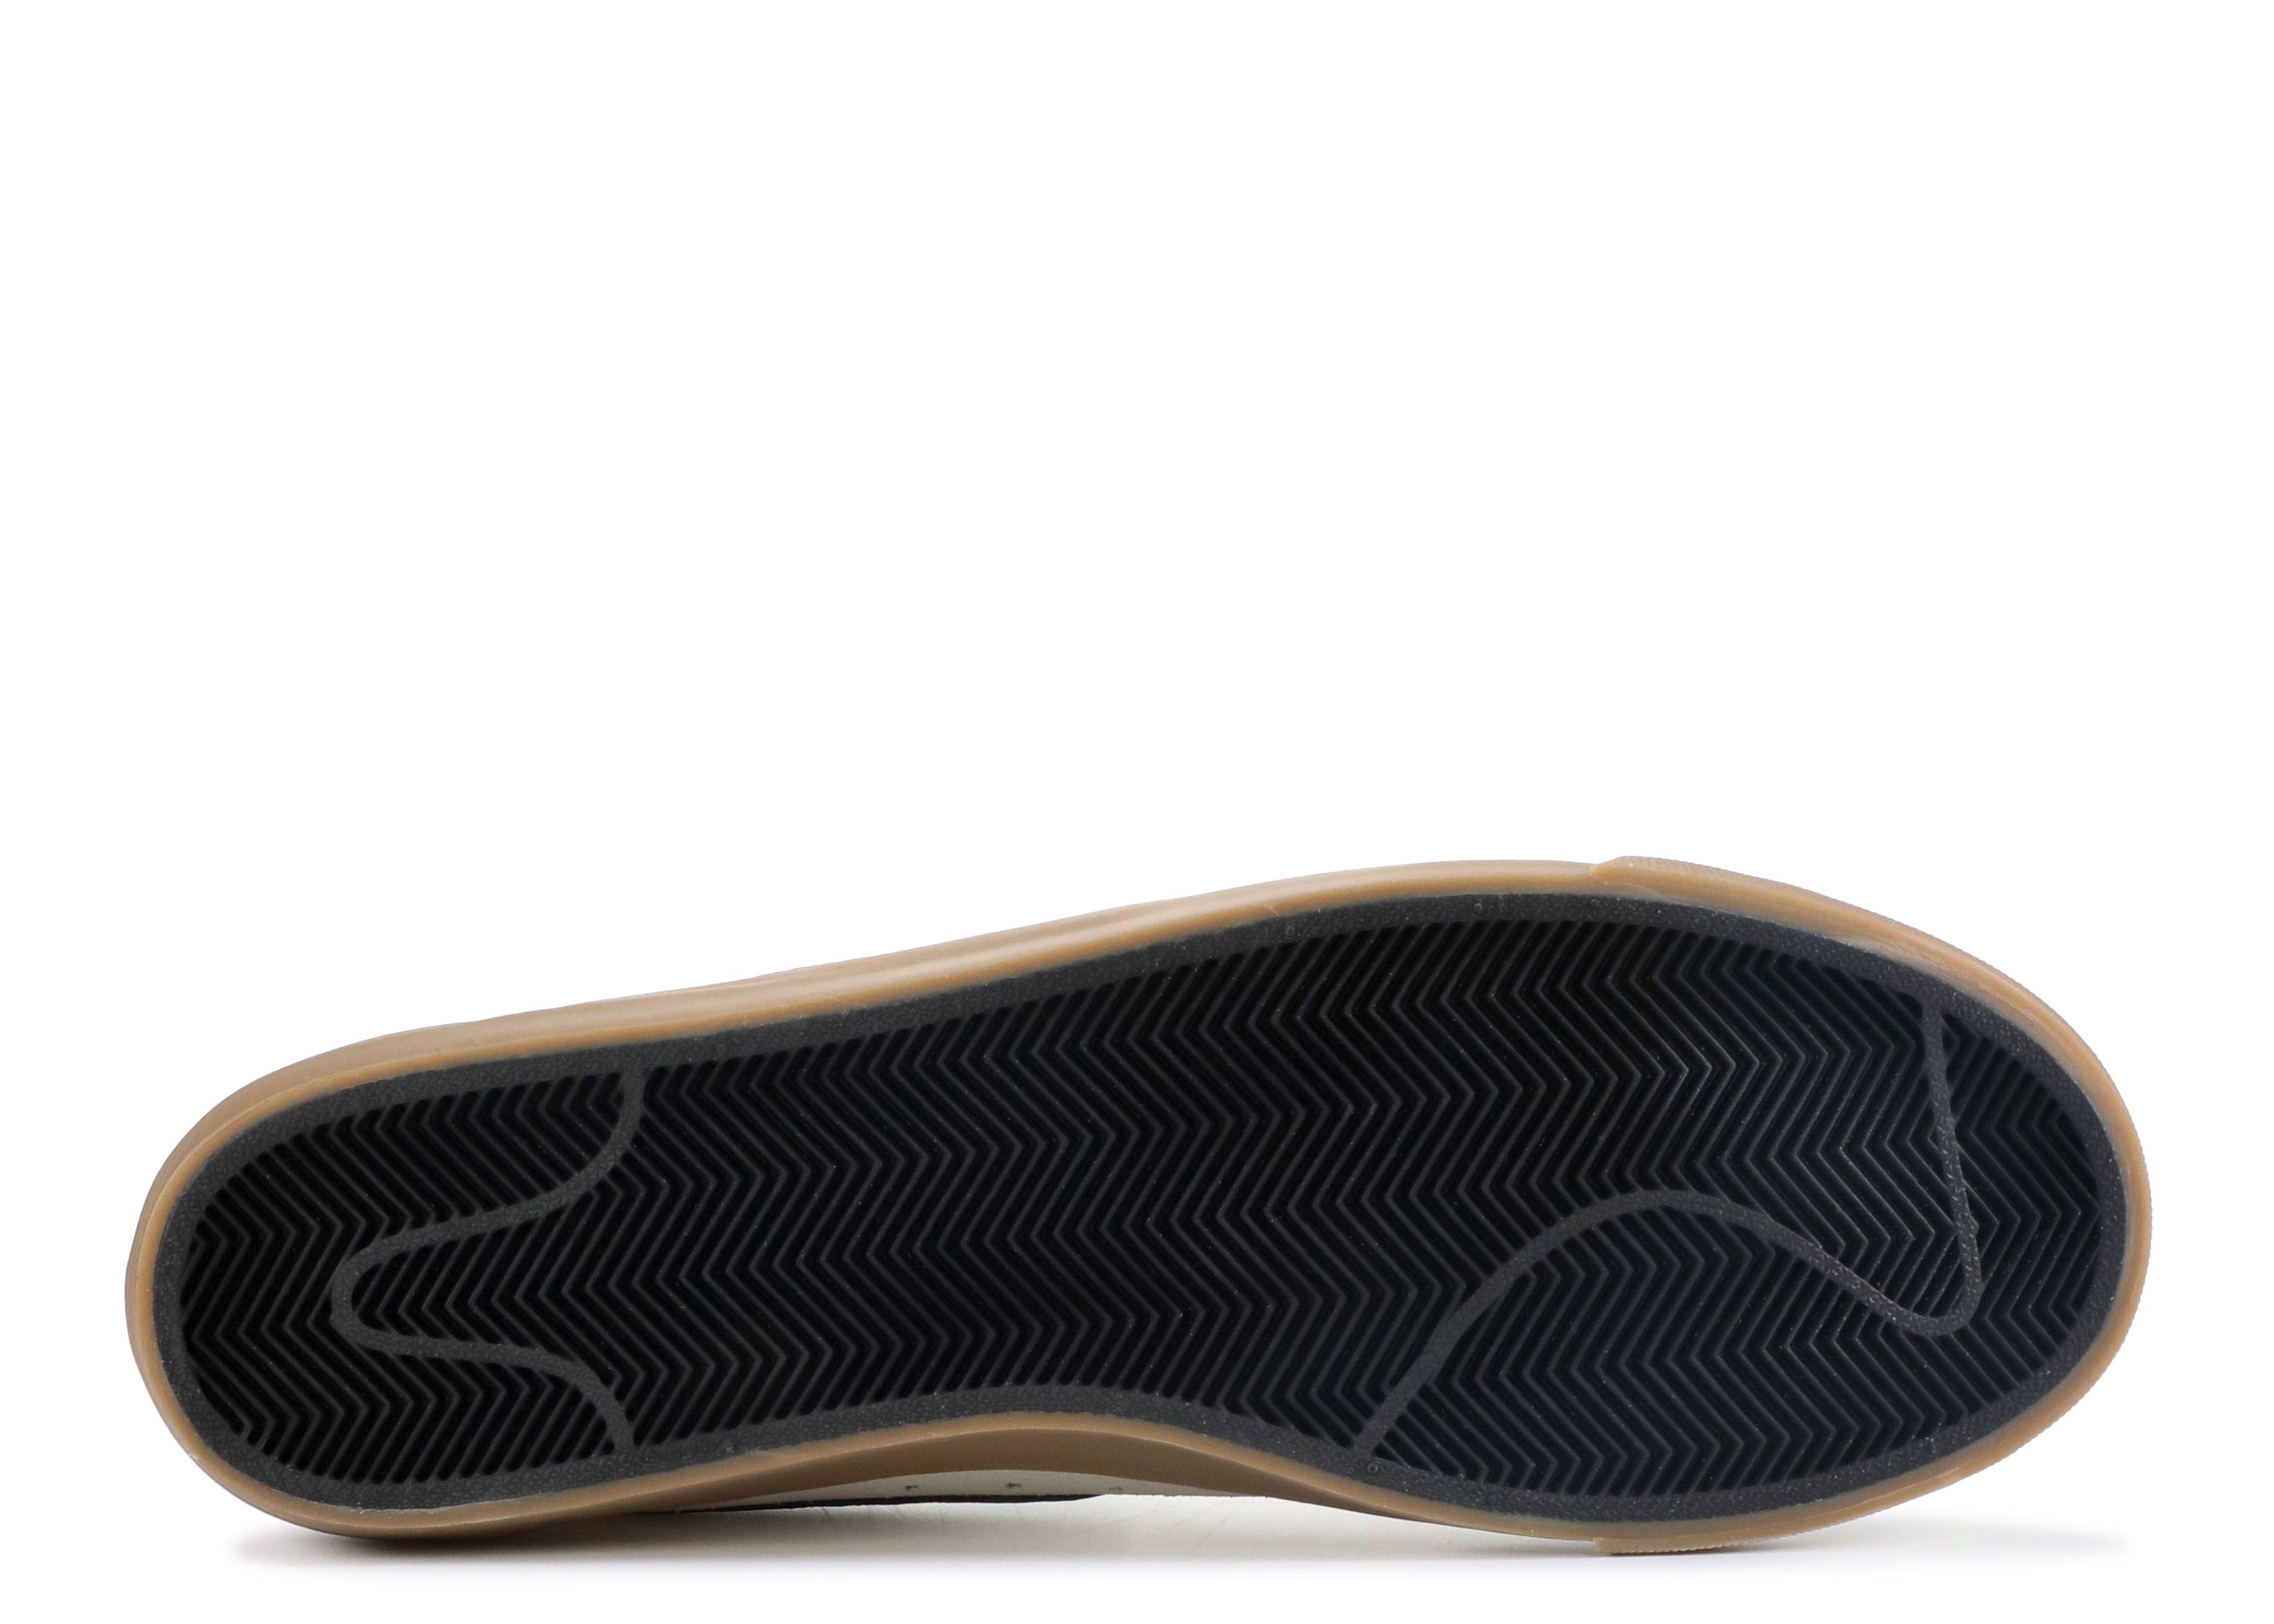 newest 00a93 1e0a9 Blazer Low GT - Nike - 704939 109 - ivory black-gum light brown   Flight  Club